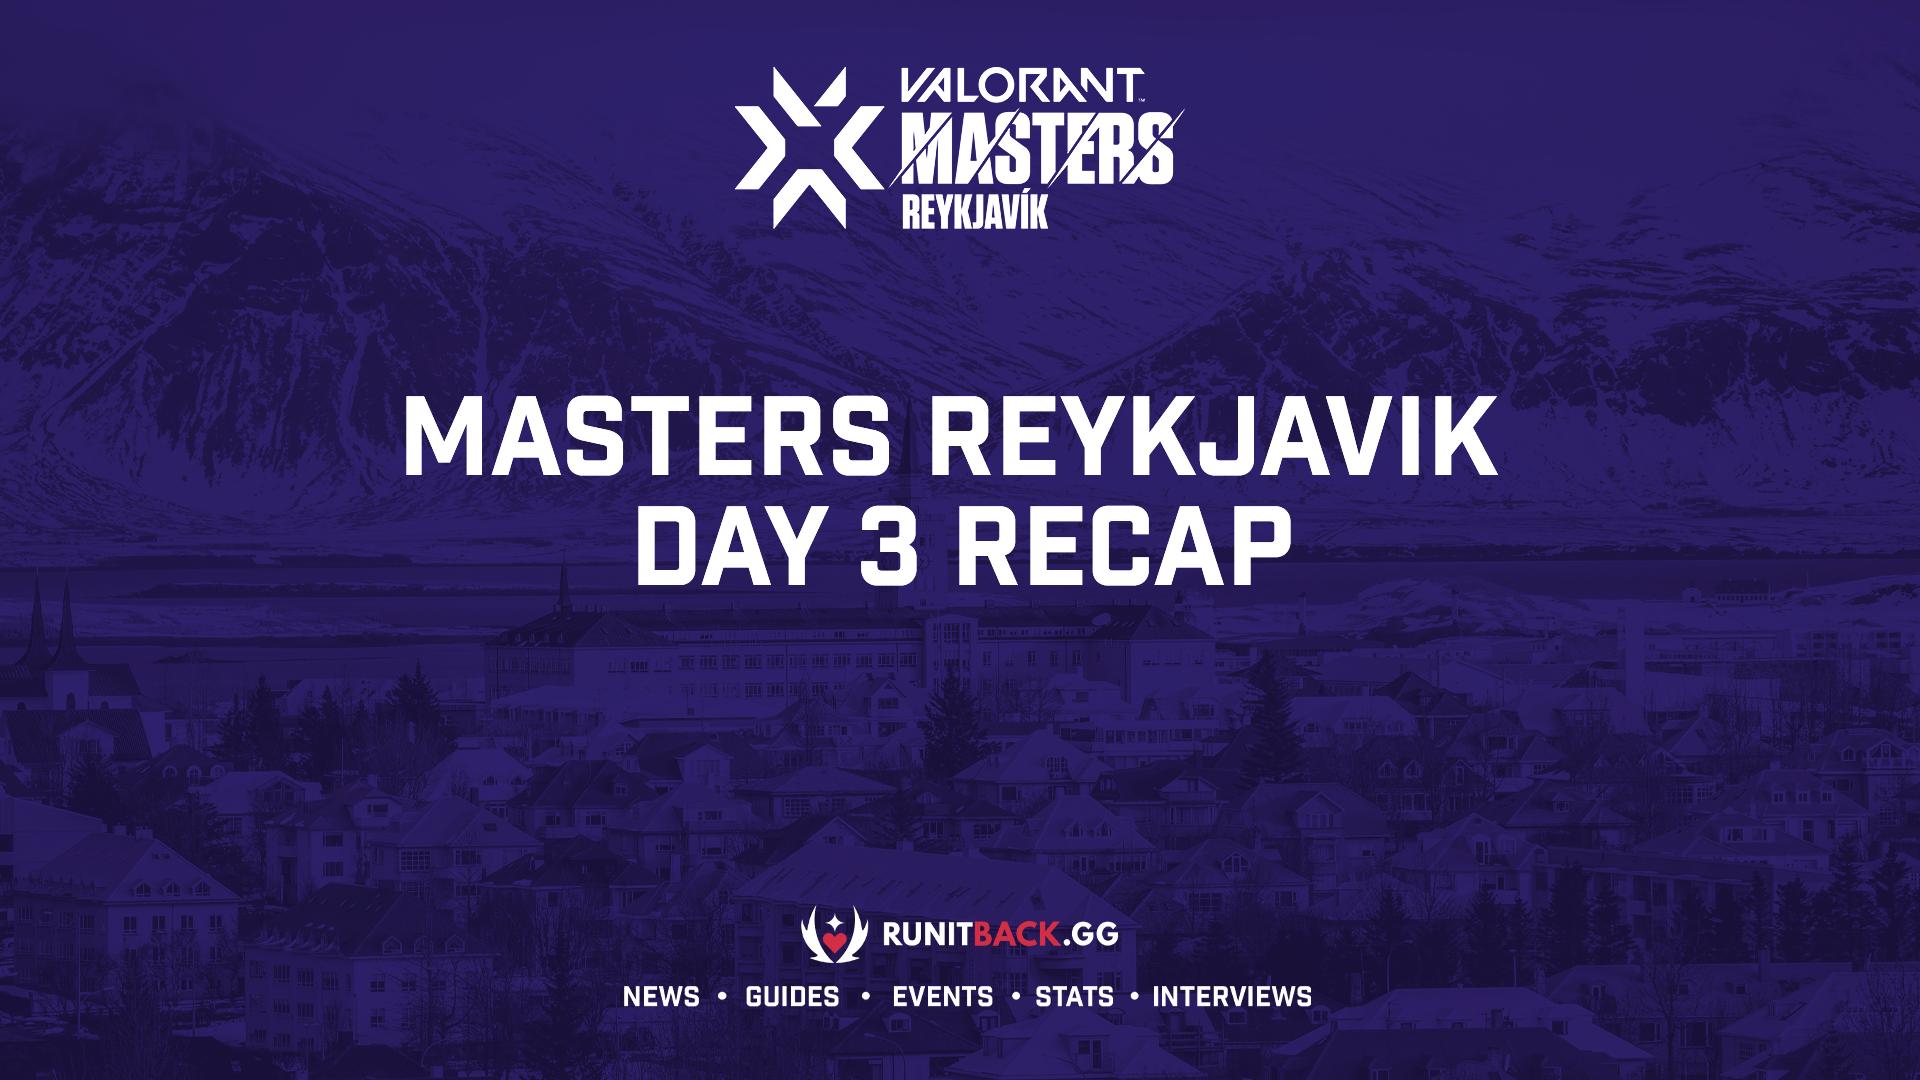 Masters Reykjavik sees first pair of teams eliminated — Day 3 Recap